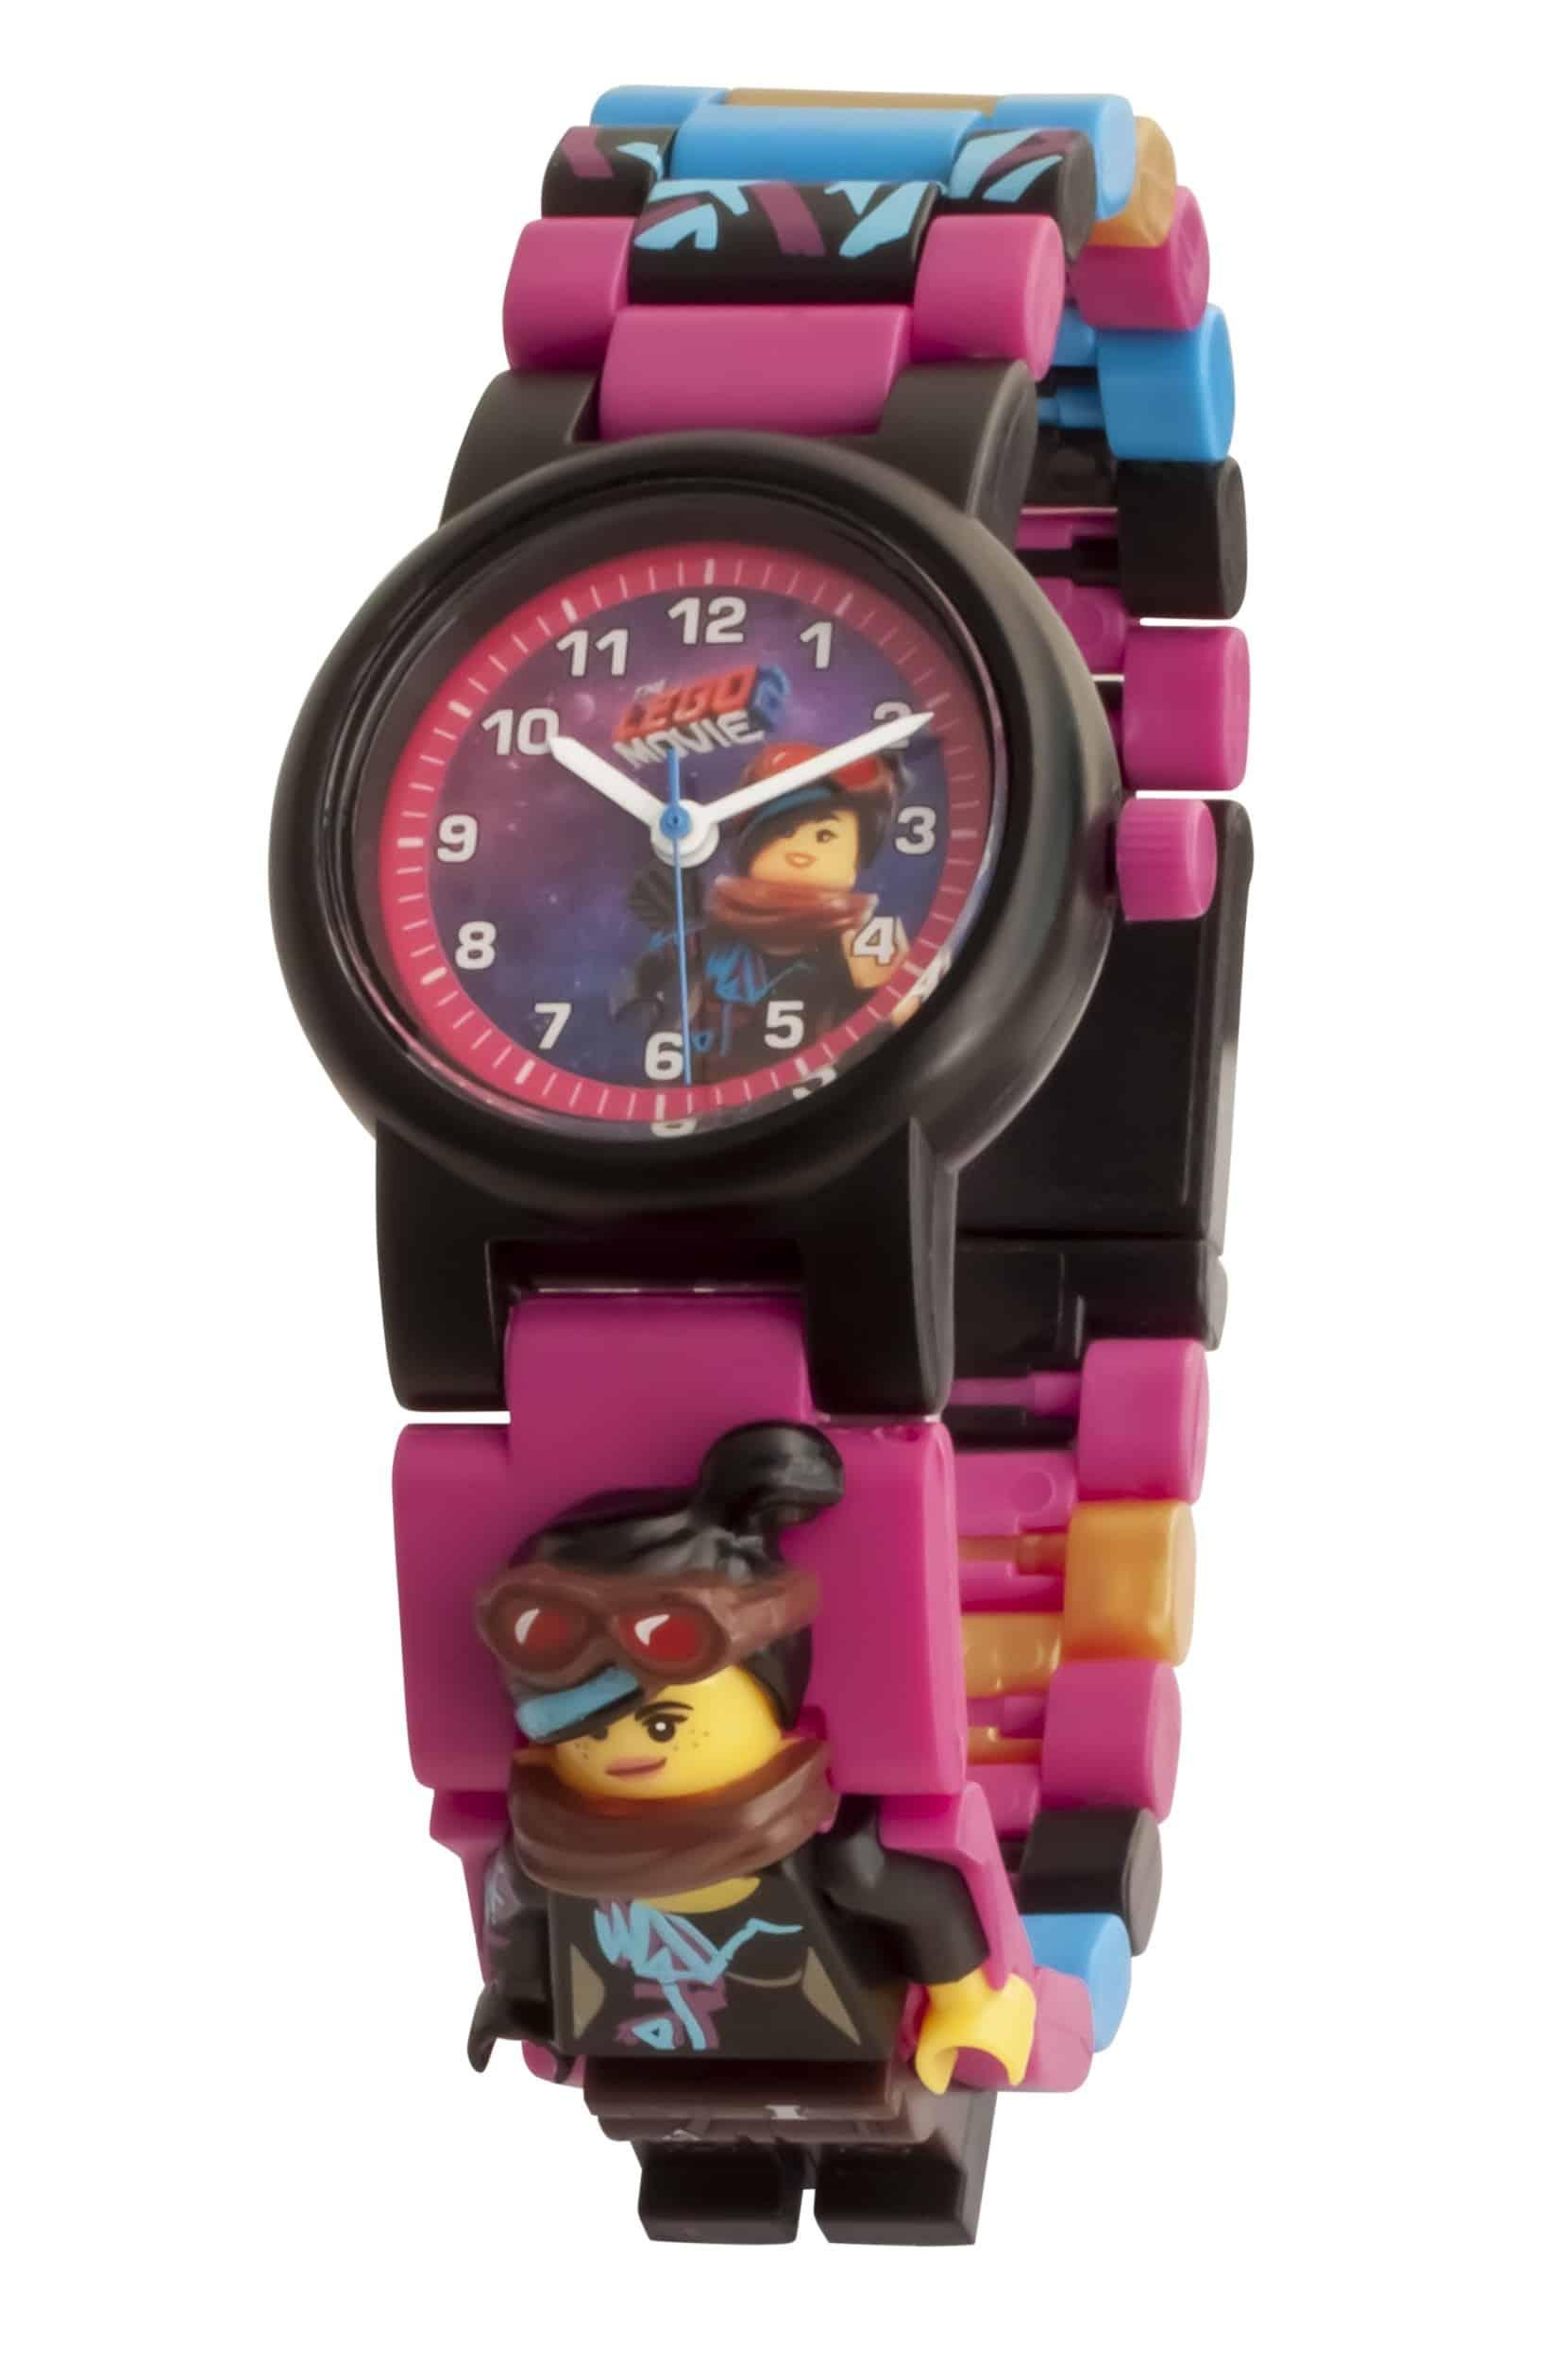 horloge met schakels van wyldstyle minifiguur uit the lego movie 2 5005703